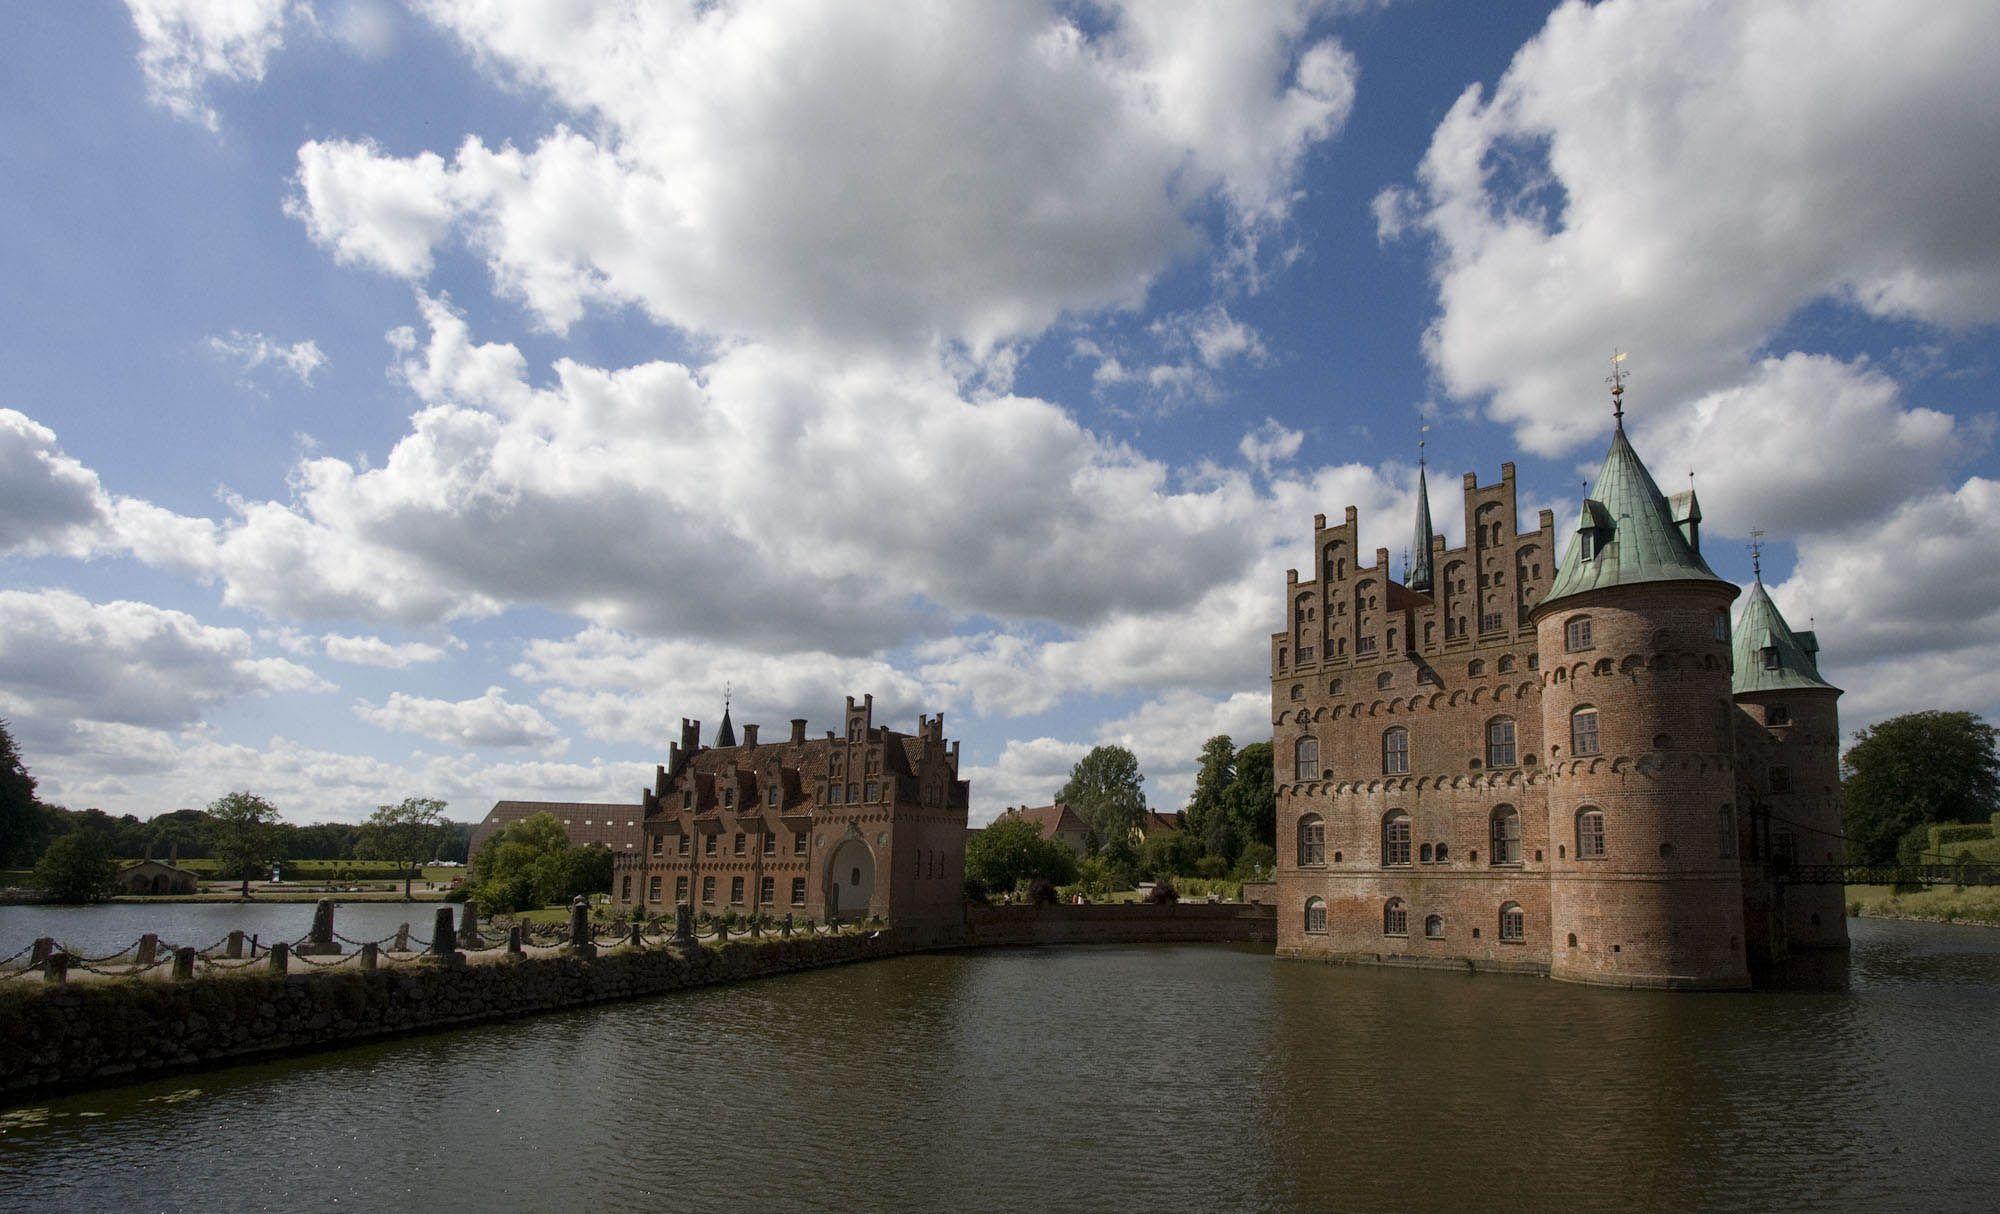 egeskov Egeskov Renaissance Water Castle in Denmark